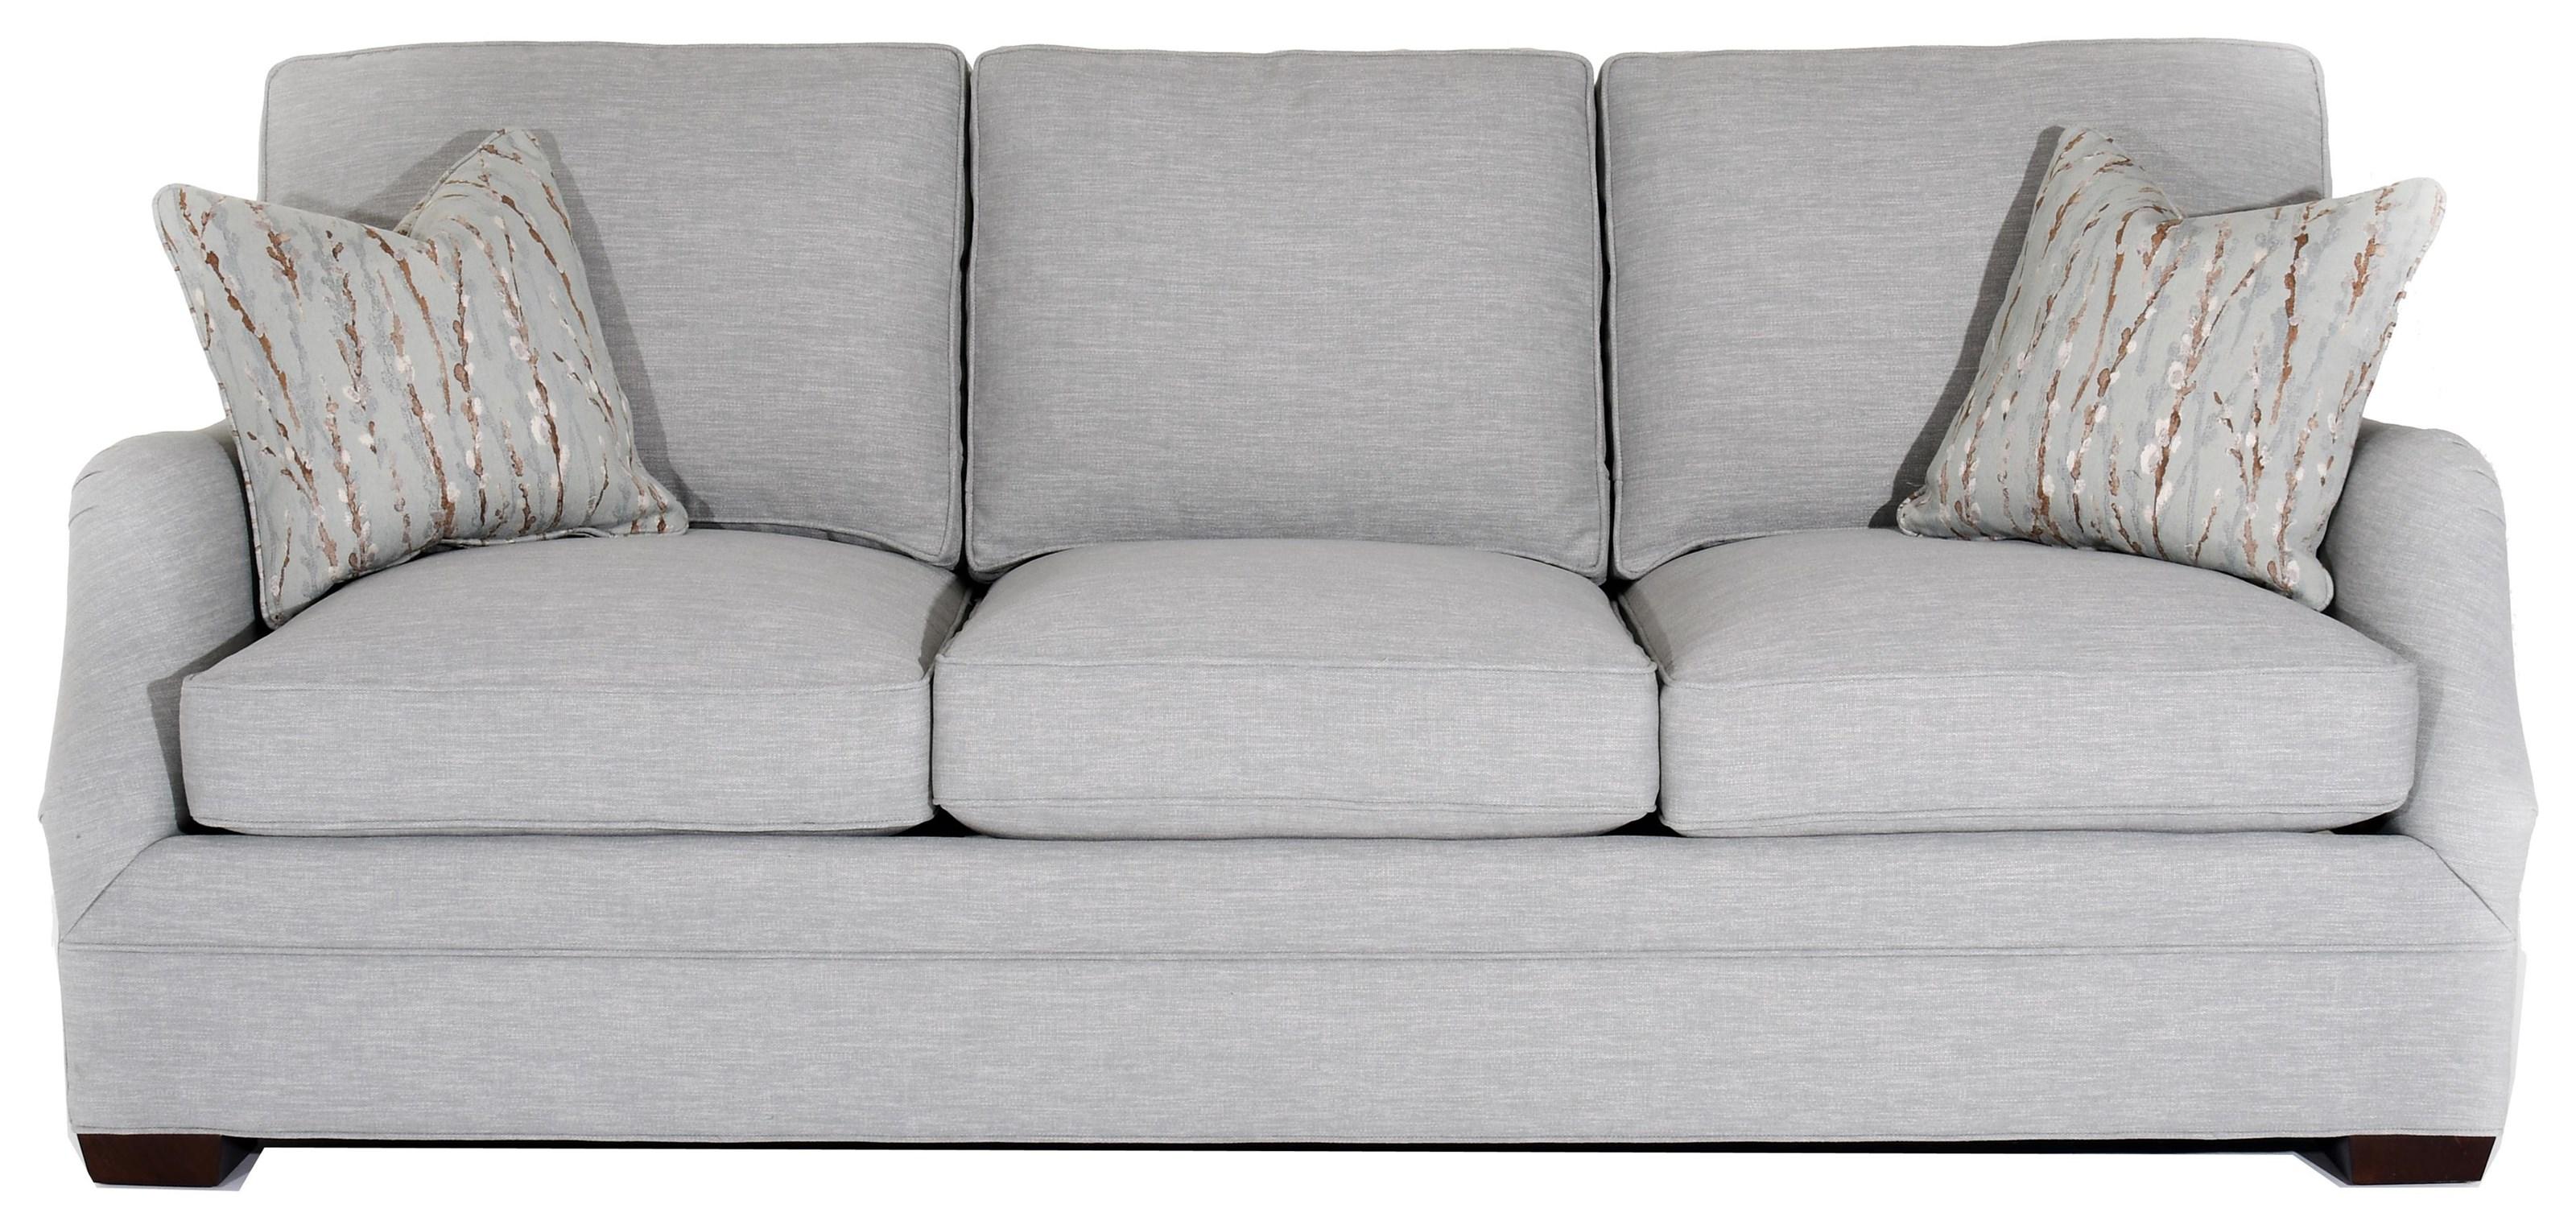 Design Your Own Customizable Three Cushion Sofa By Sherrill At Baeru0027s  Furniture